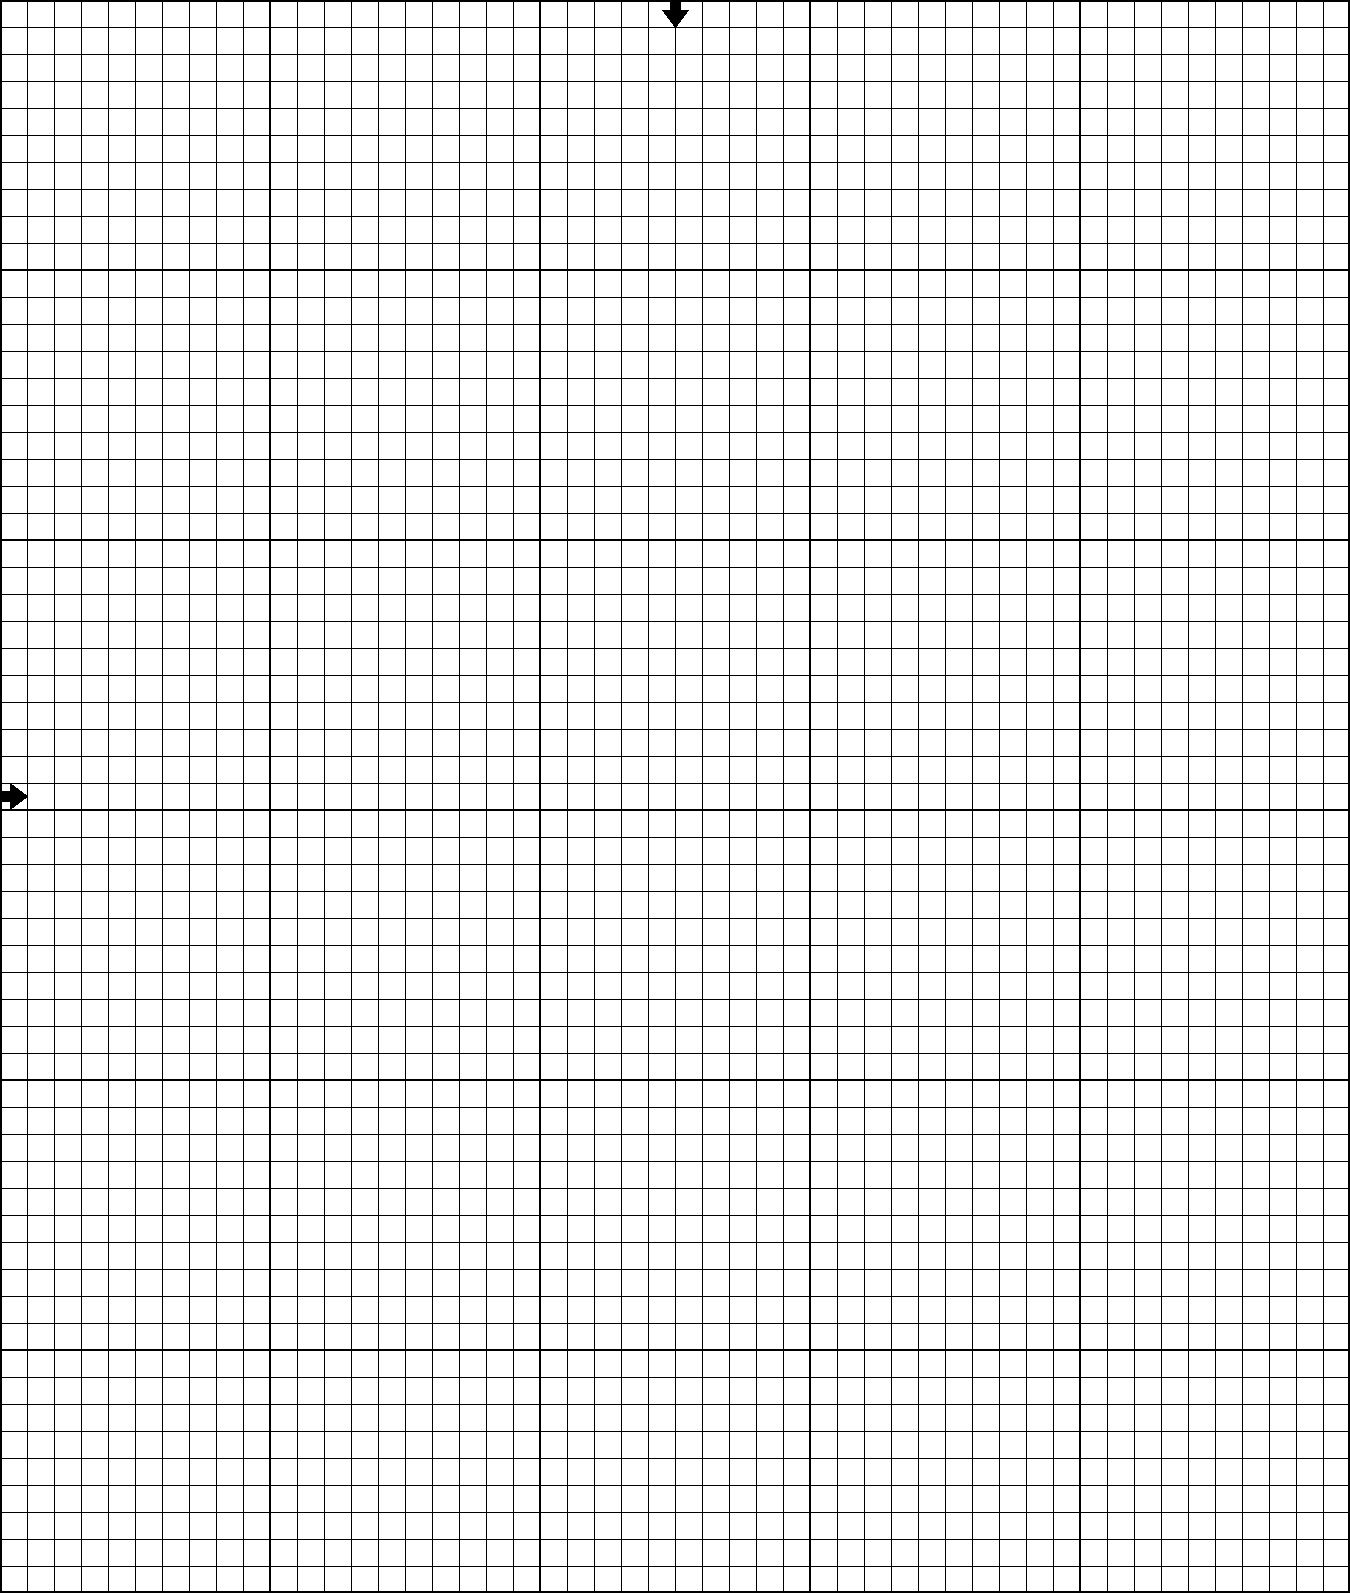 blank grid chart – Blank Grid Chart